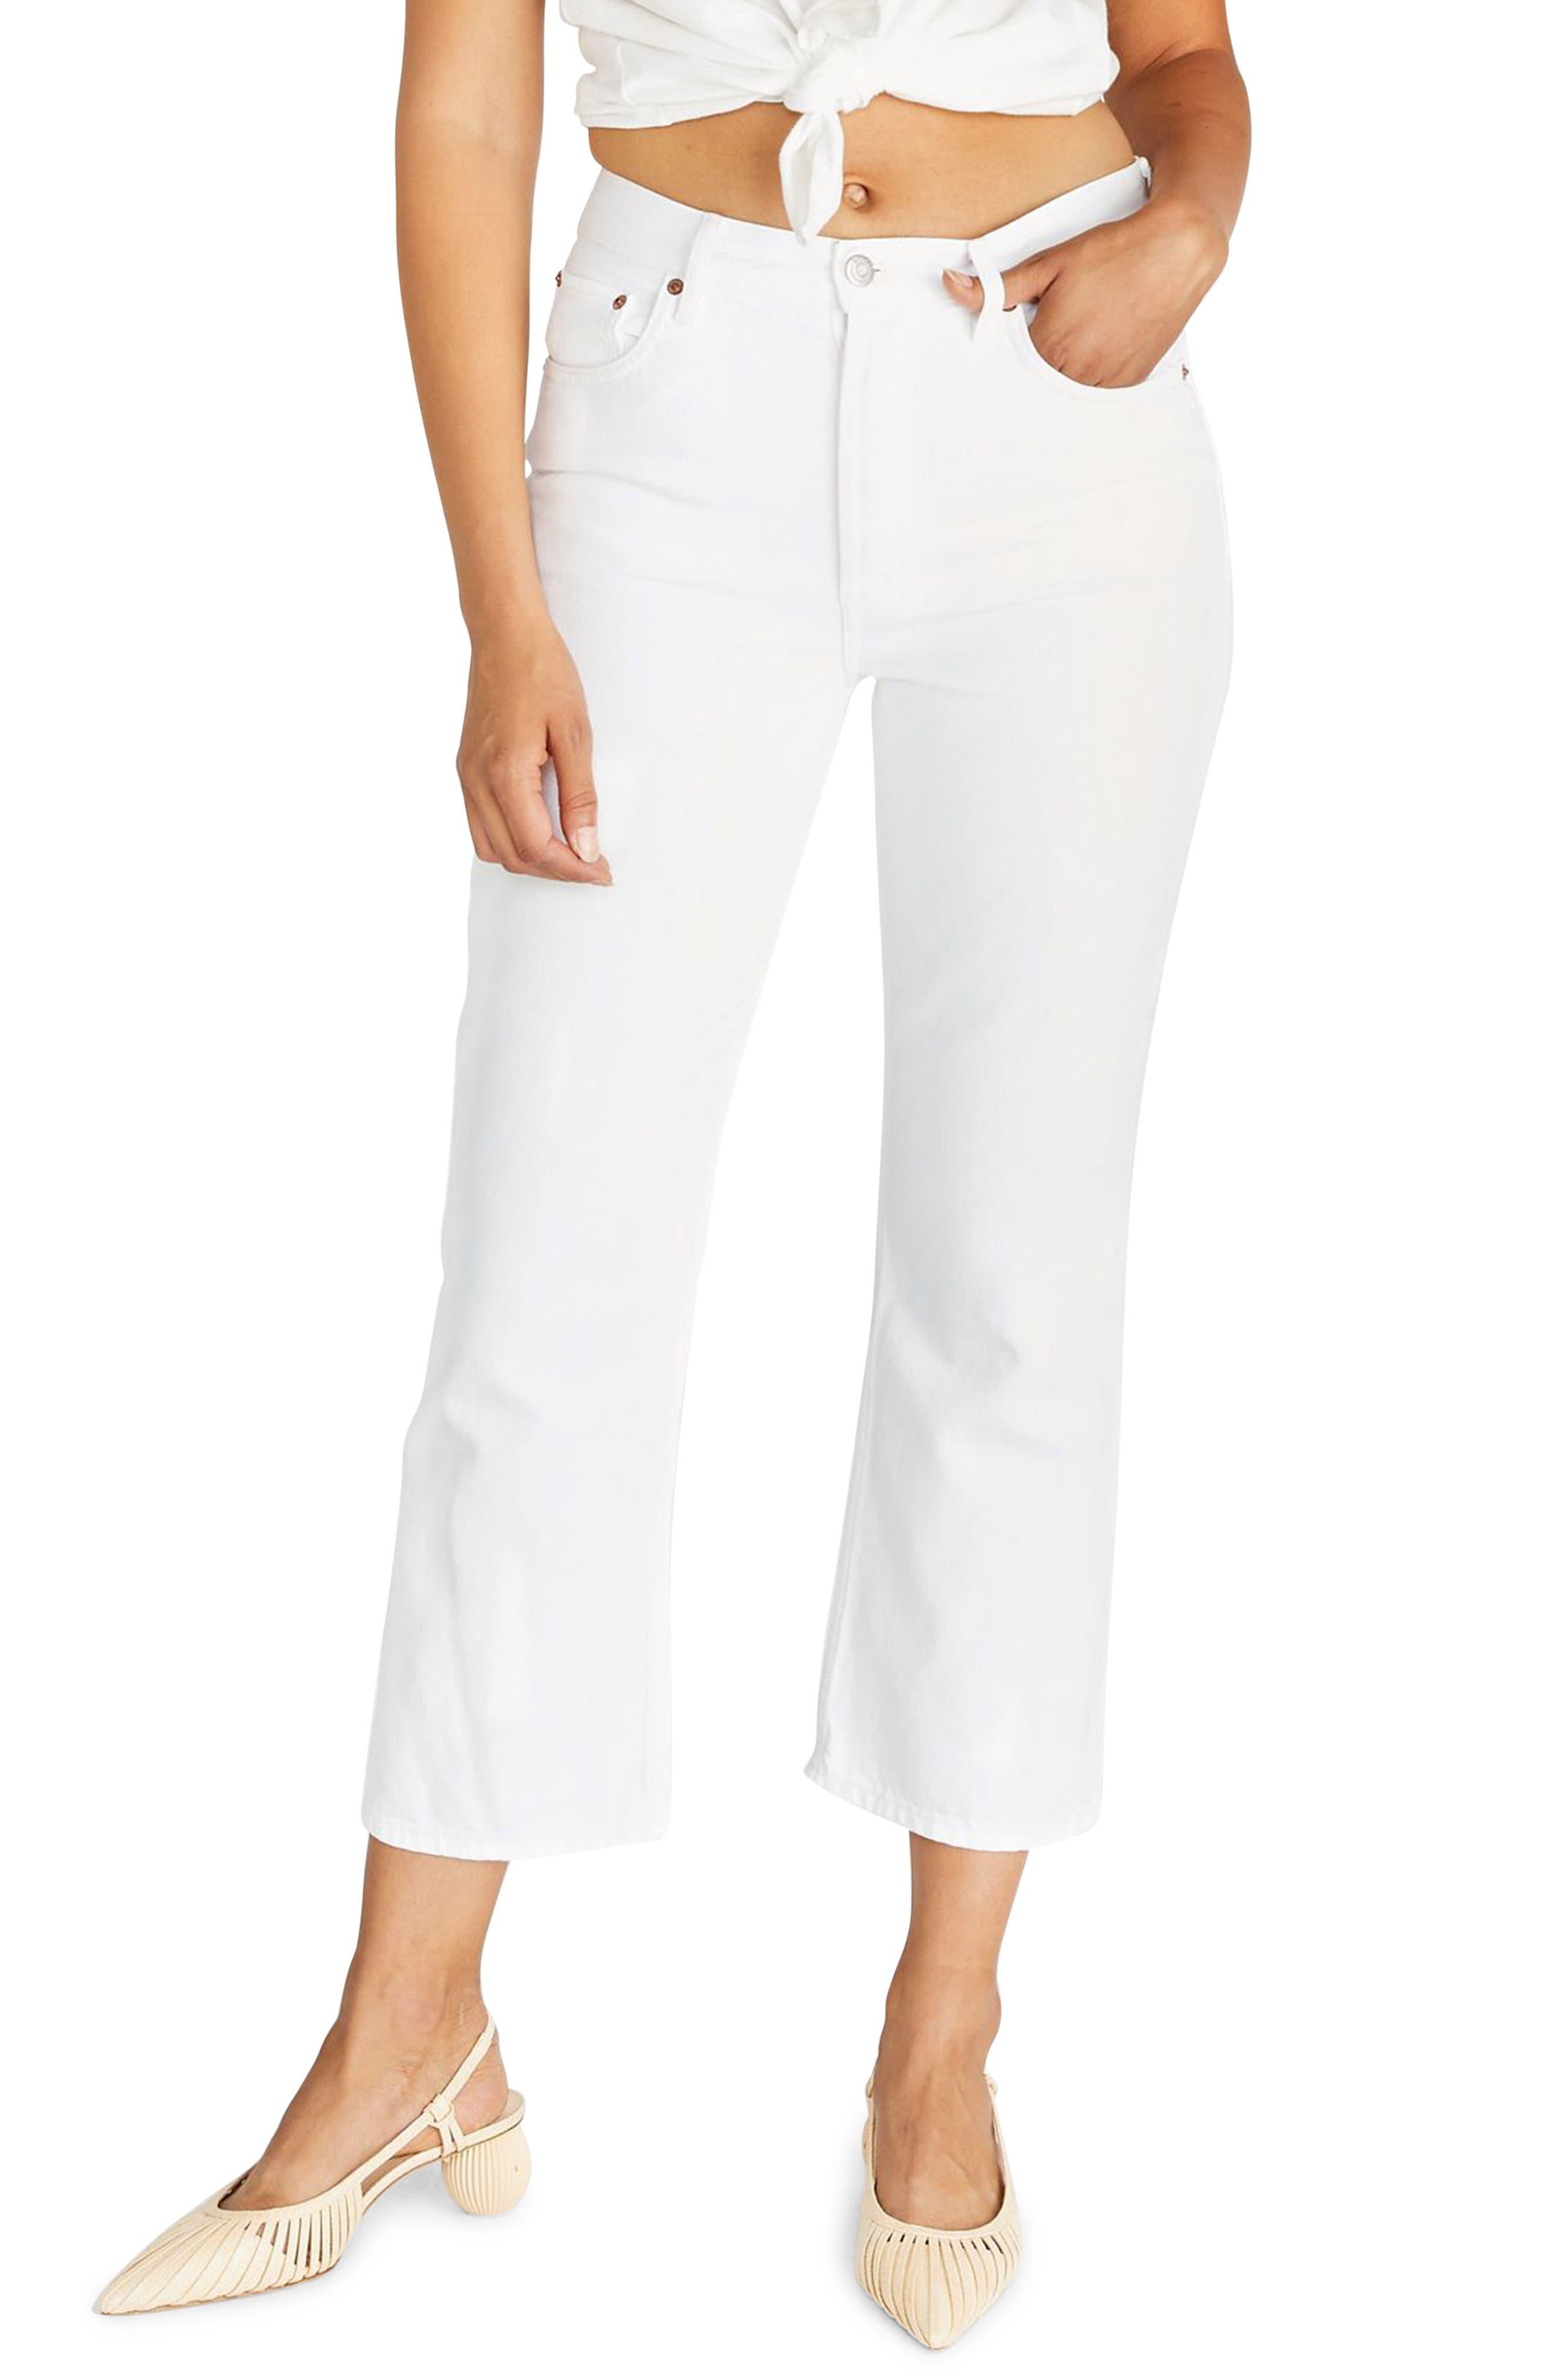 Women's Etica Josie Pop Crop High Rise Jeans